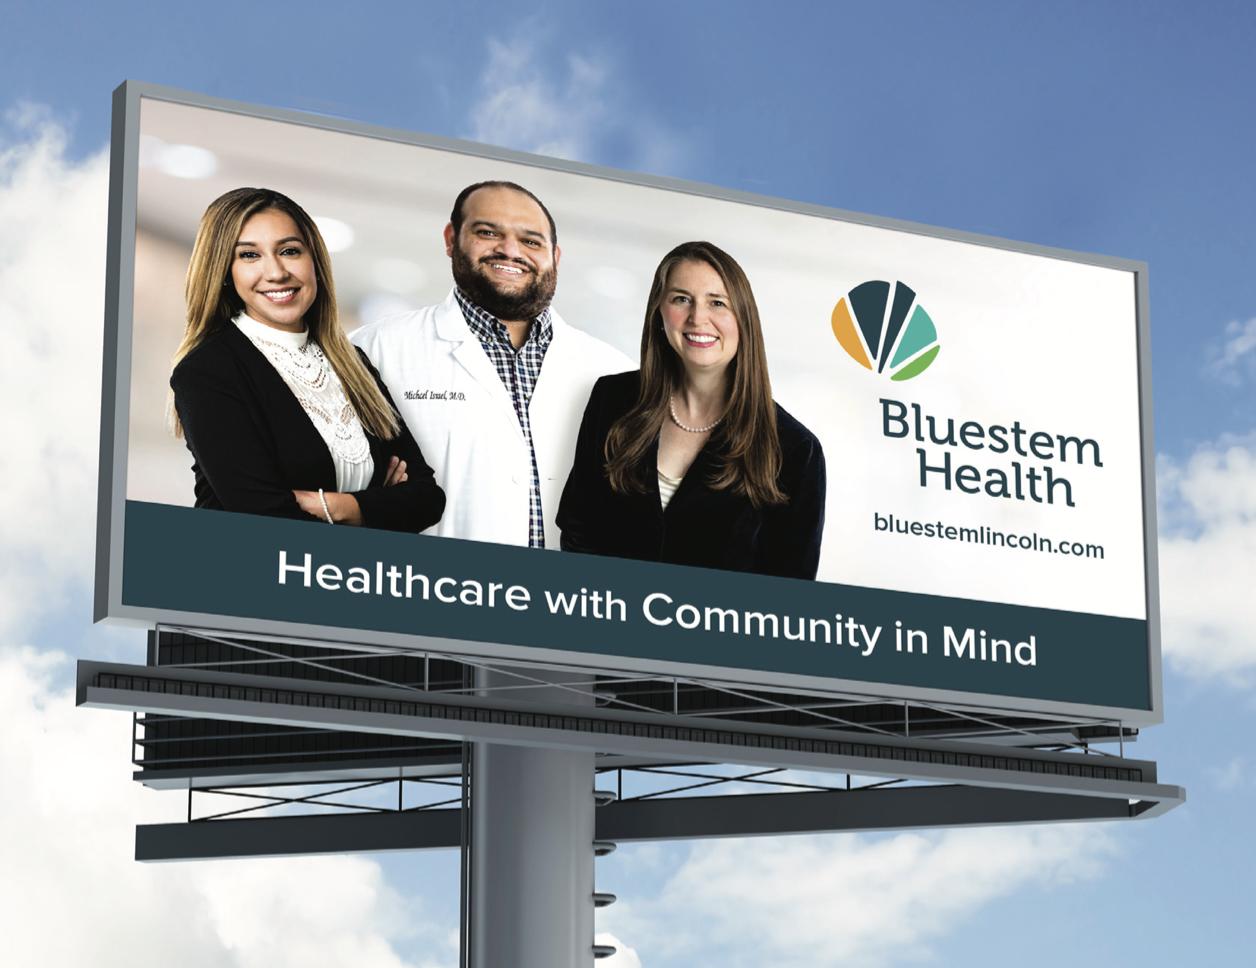 Main Image for Bluestem Health